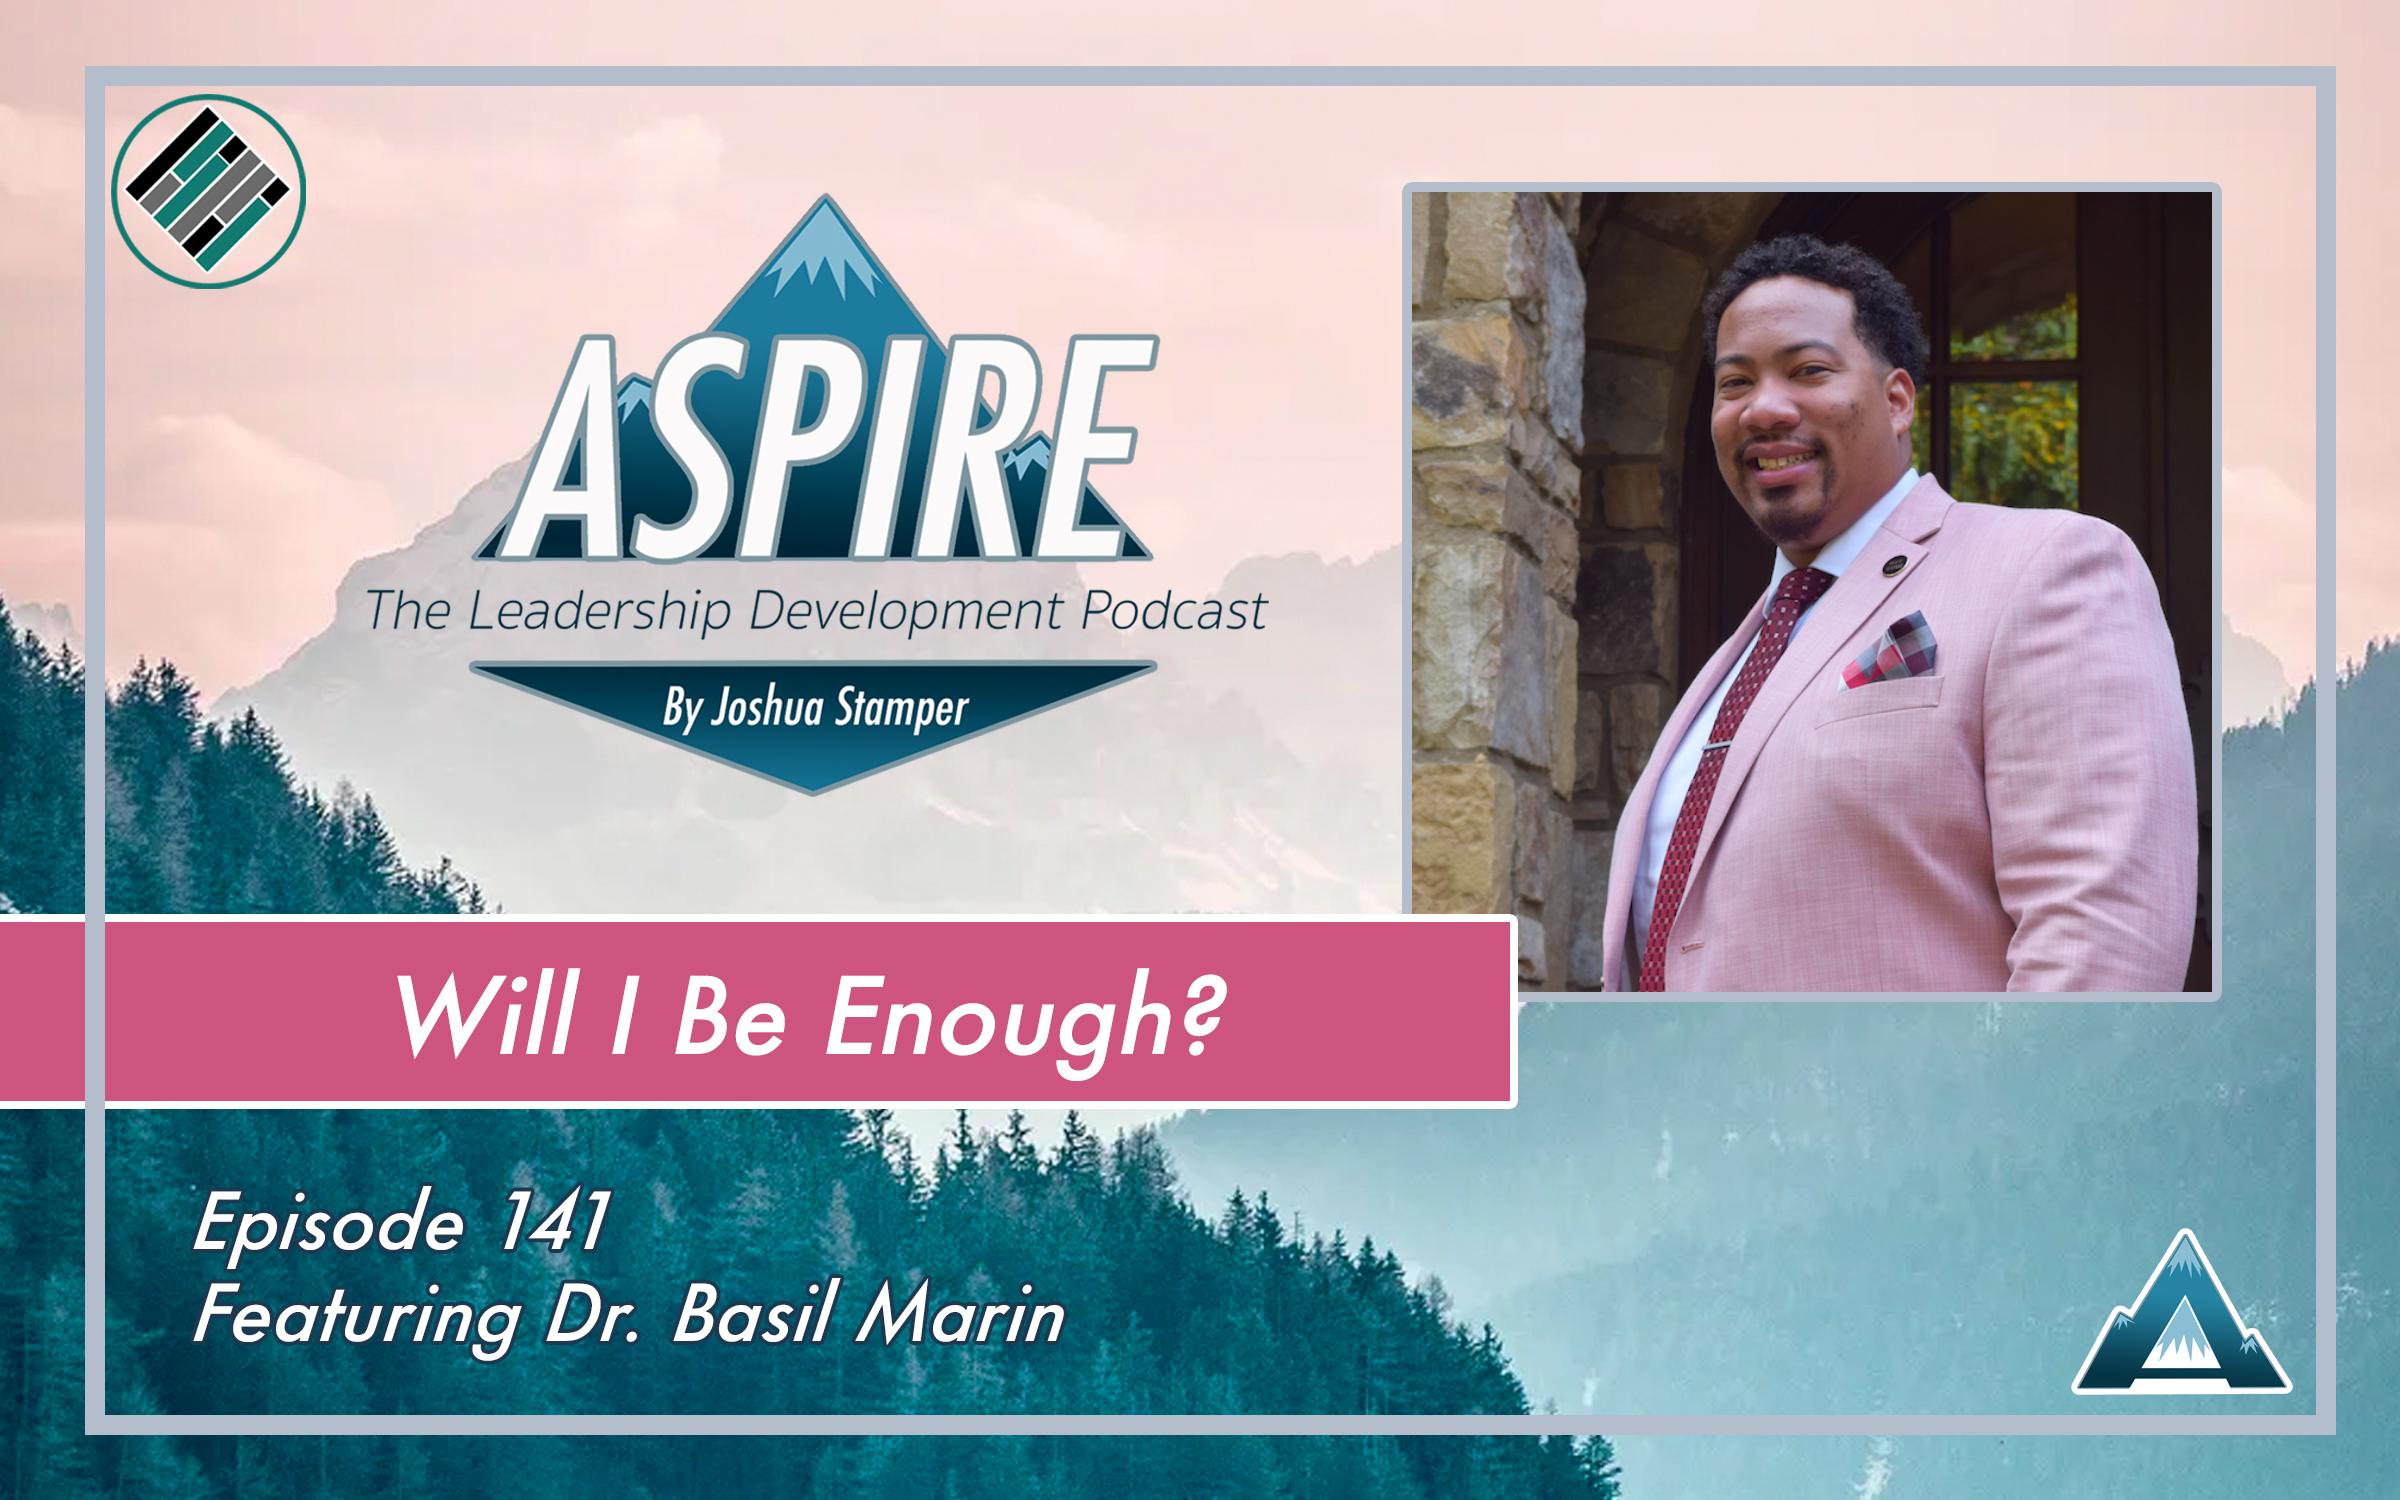 Joshua Stamper, Aspire: The Leadership Development Podcast, #AspireLead, Dr. Basil Marin